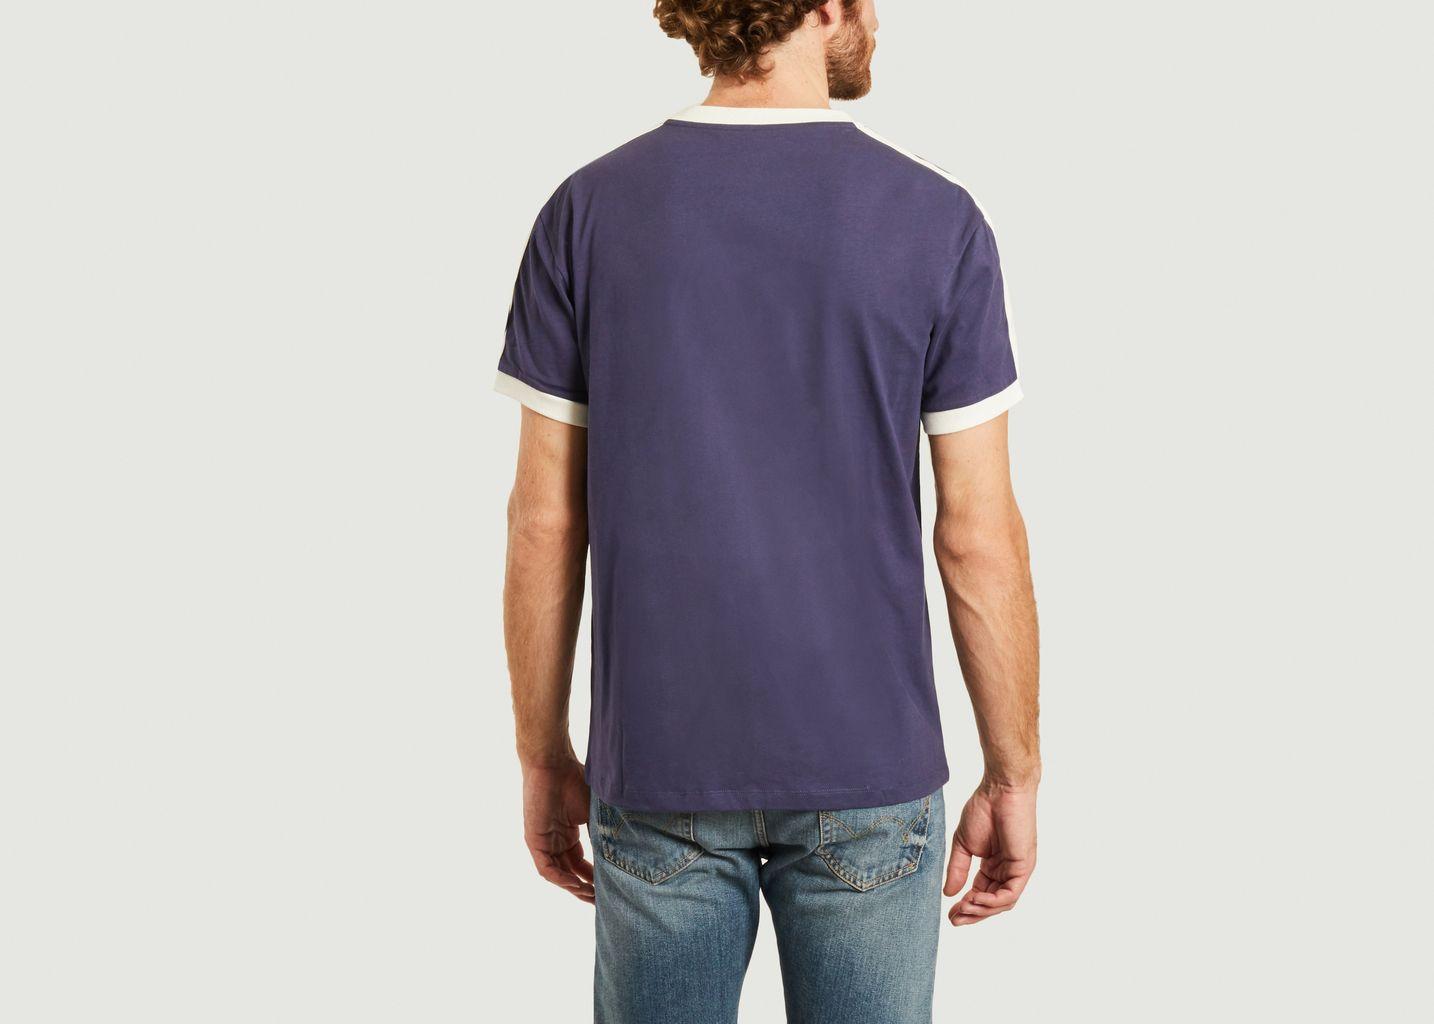 T-shirt Captain Tsubasa x Maison Labiche - Maison Labiche